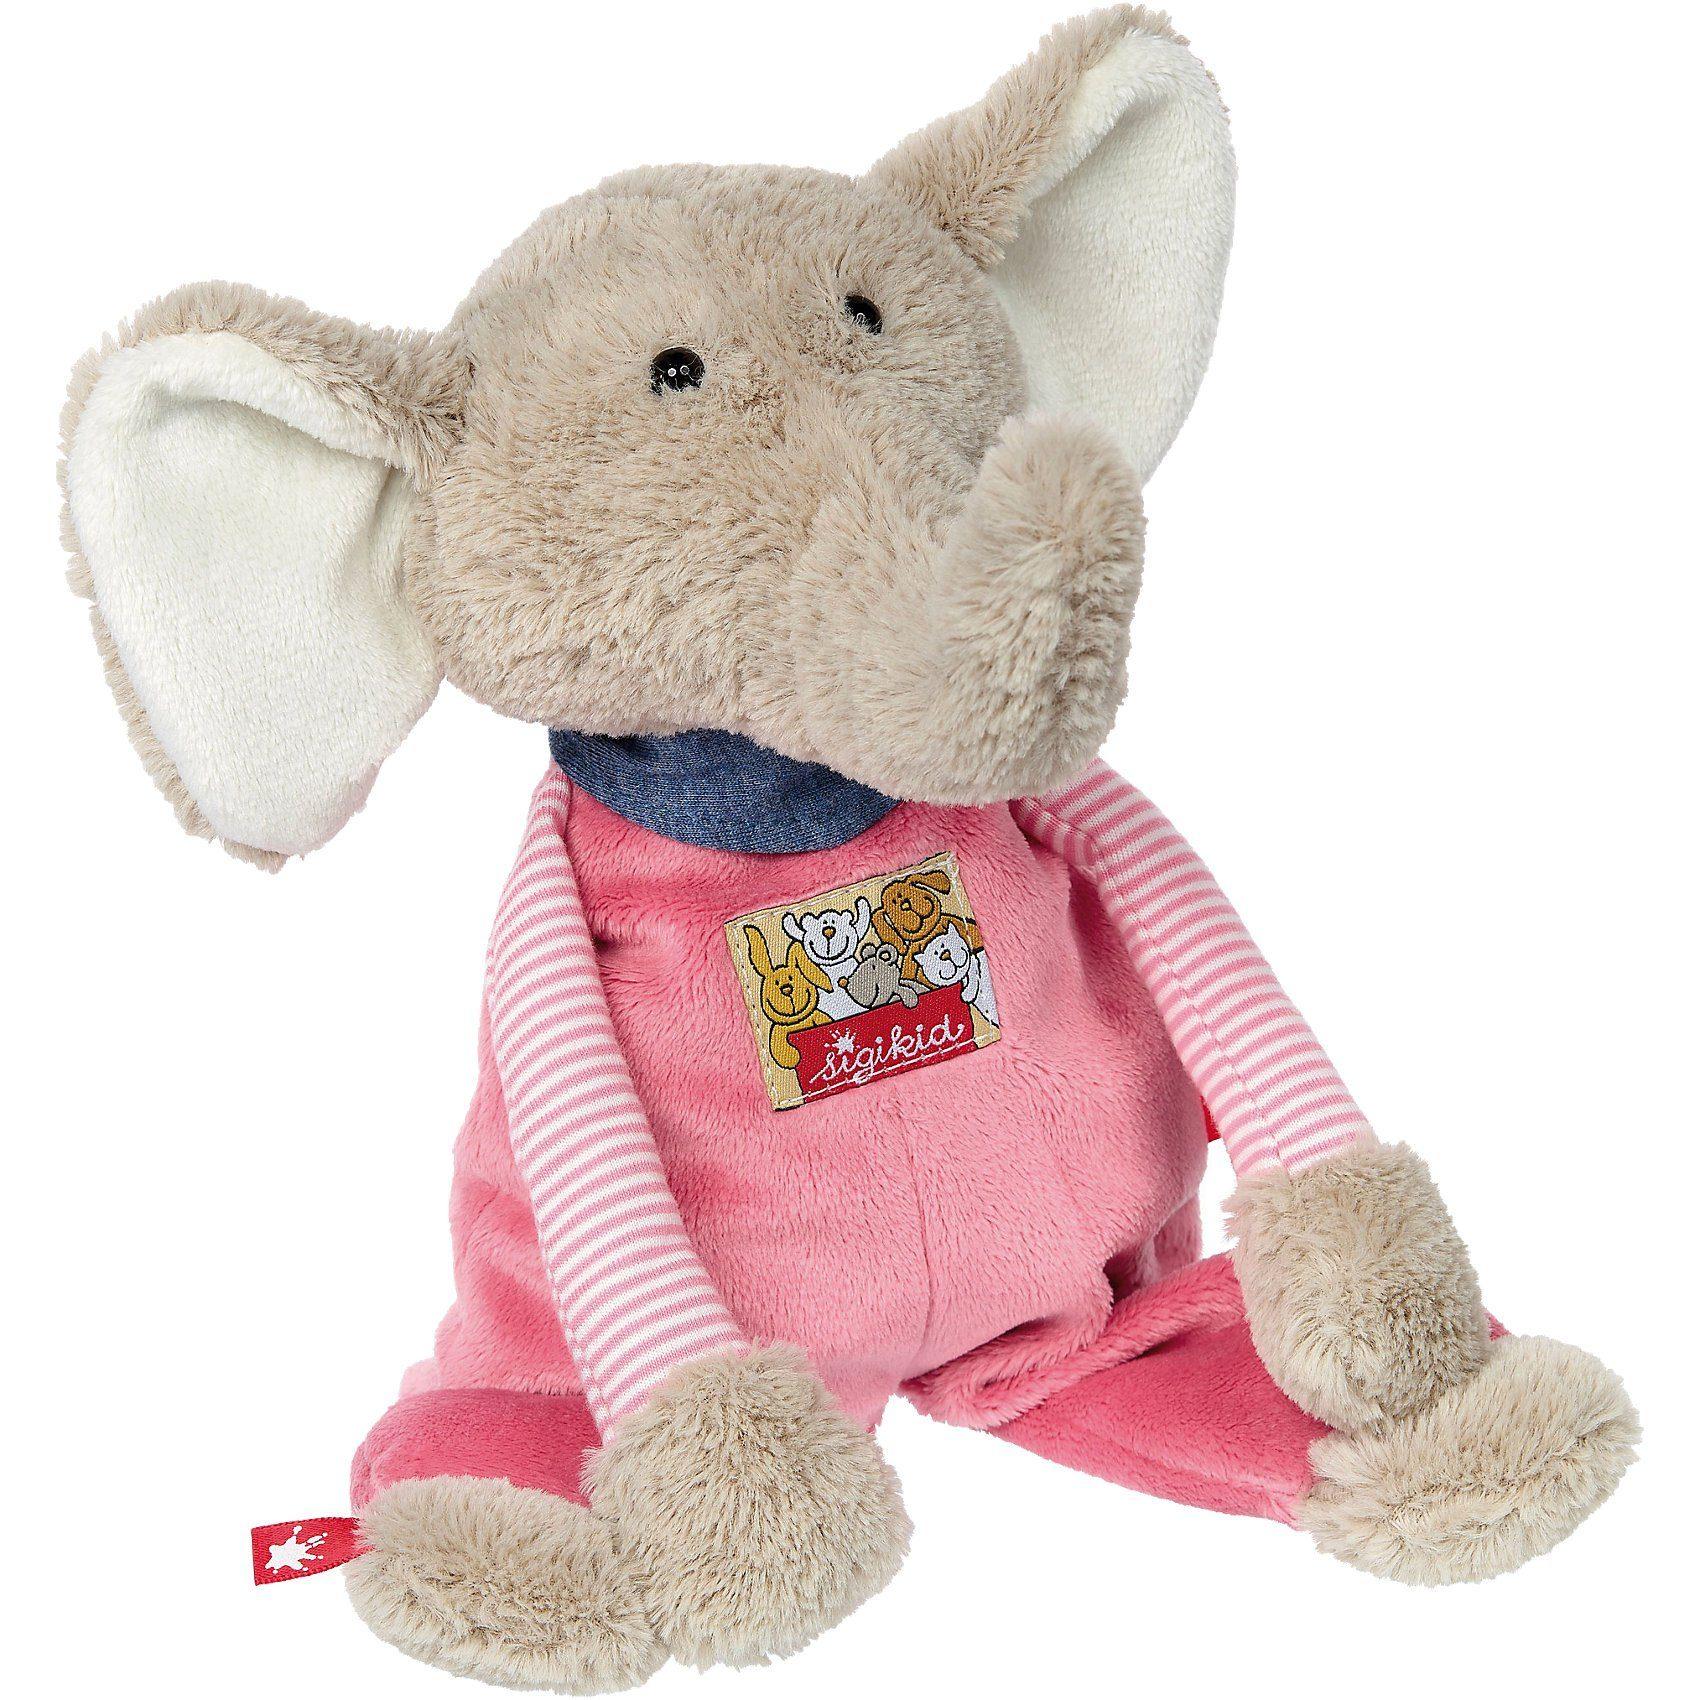 Sigikid Kuscheltier Elefant Beste Freunde (38731)